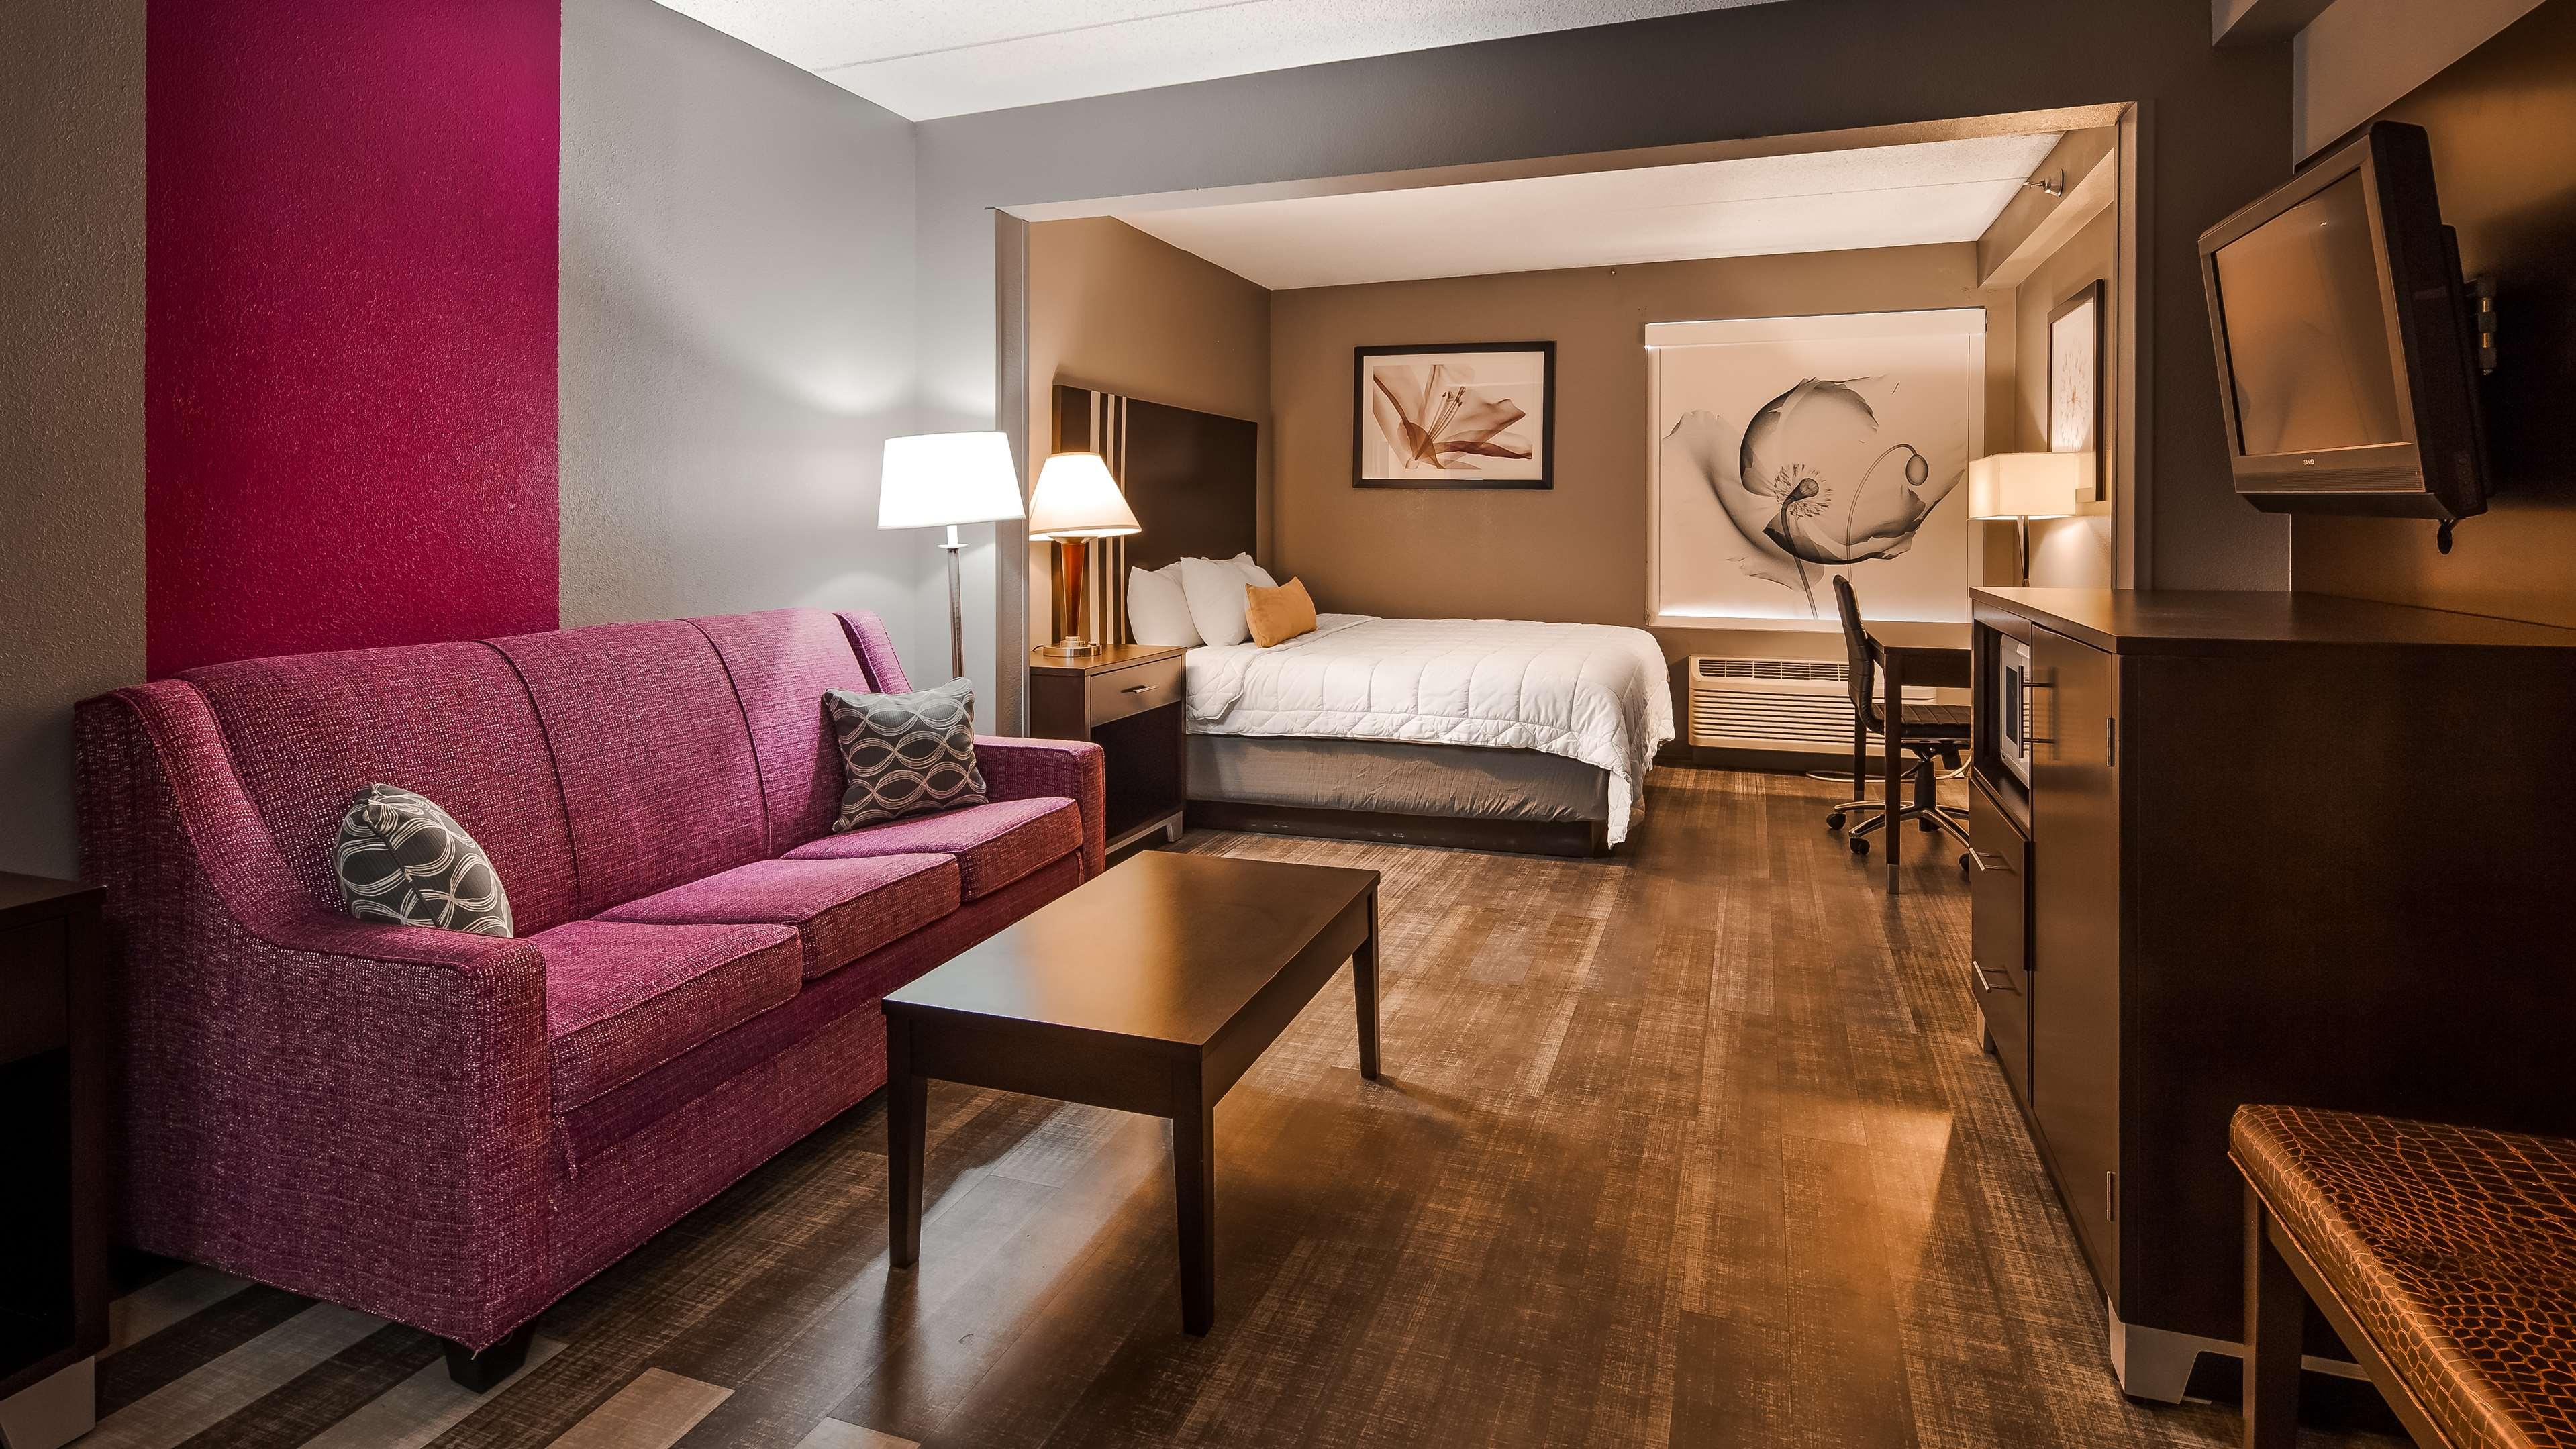 Best Western Plus Greensboro Airport Hotel image 7